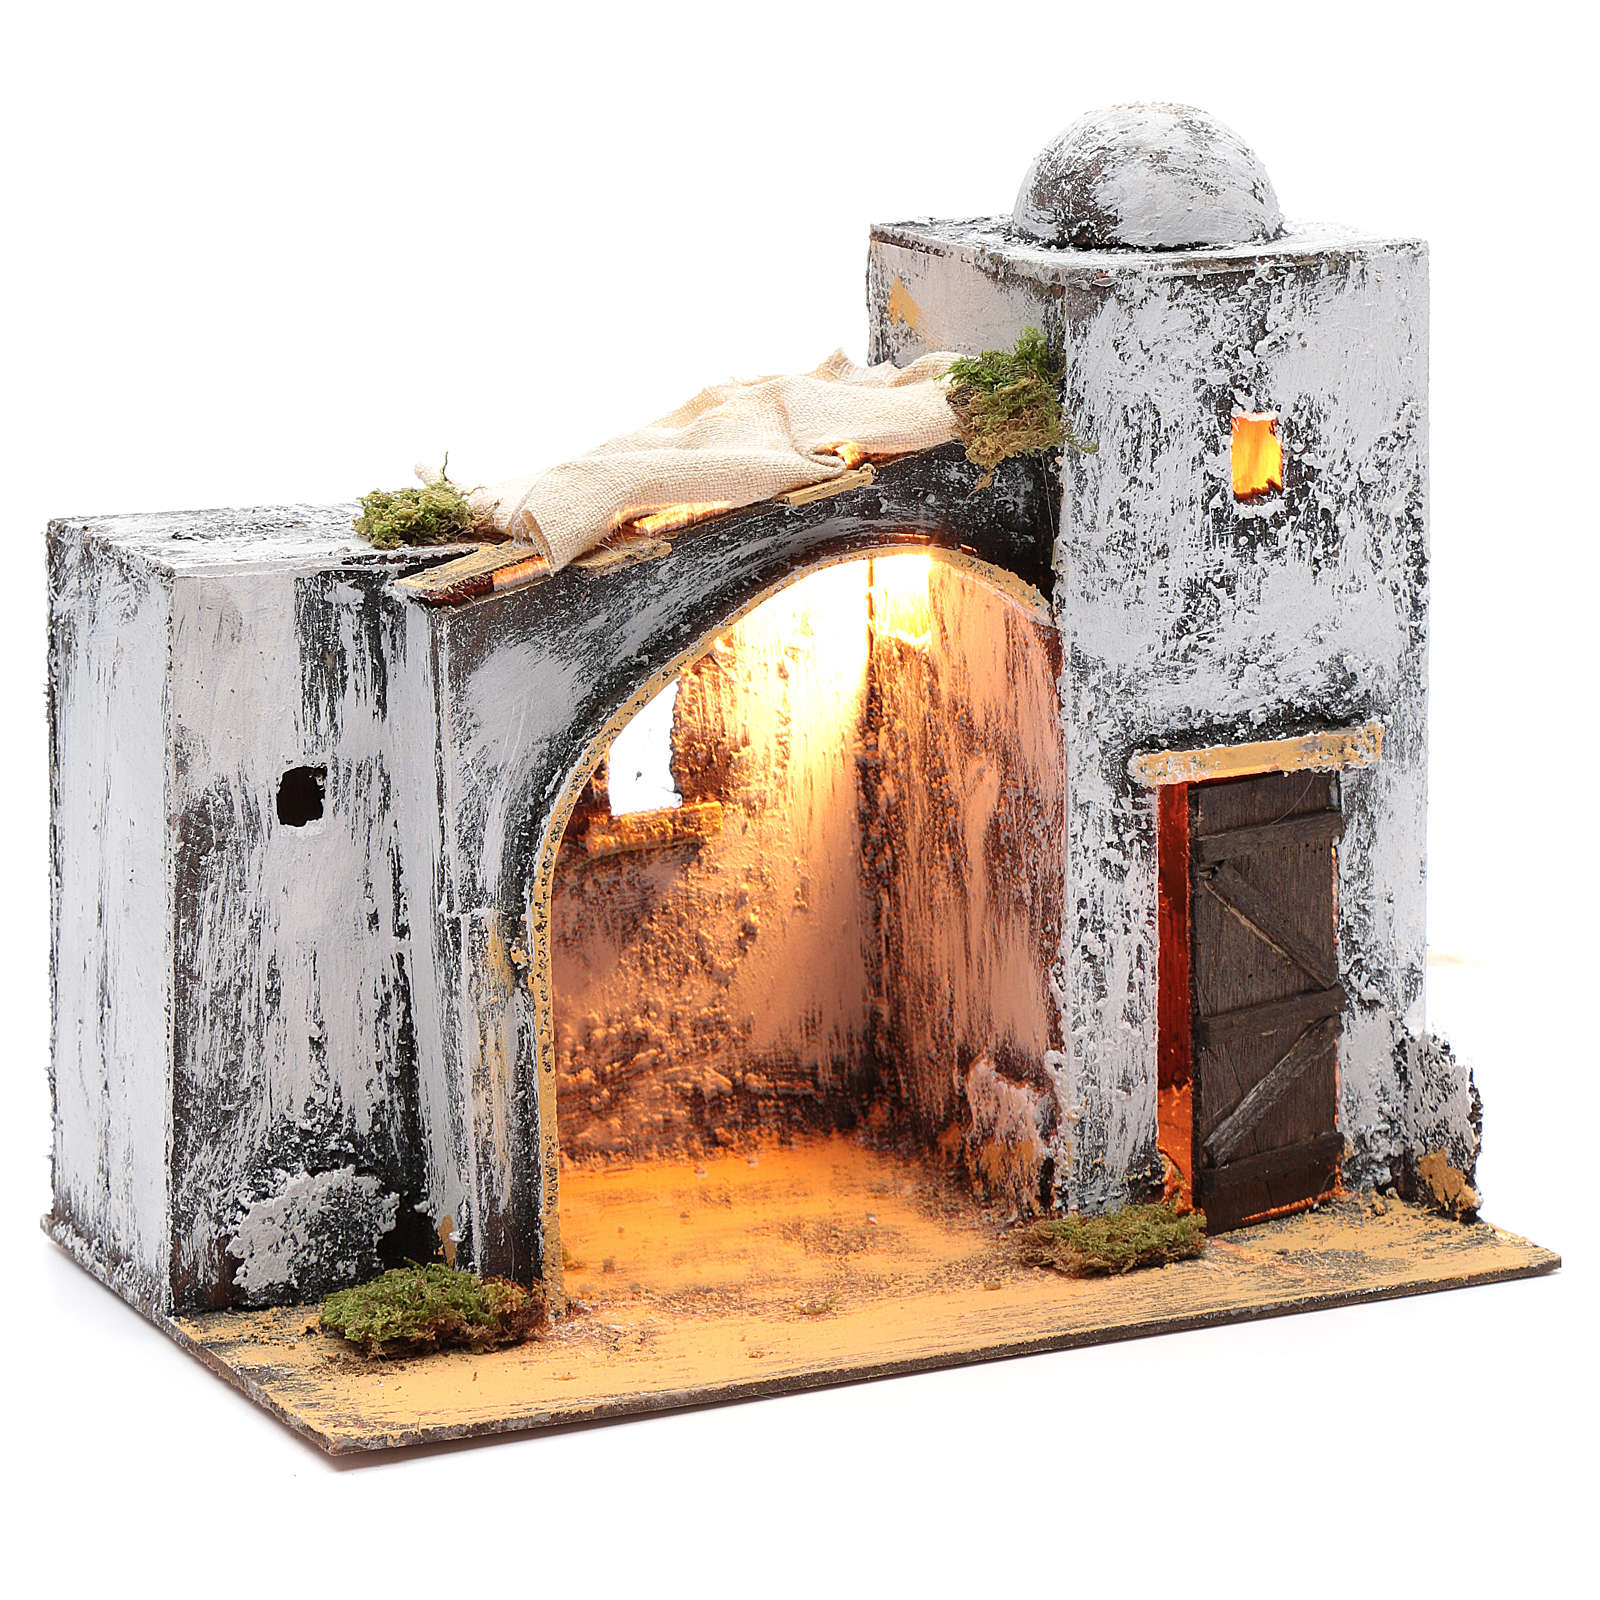 Neapolitan nativity scene Arabian style setting with door and hut 30x30x20 cm 4